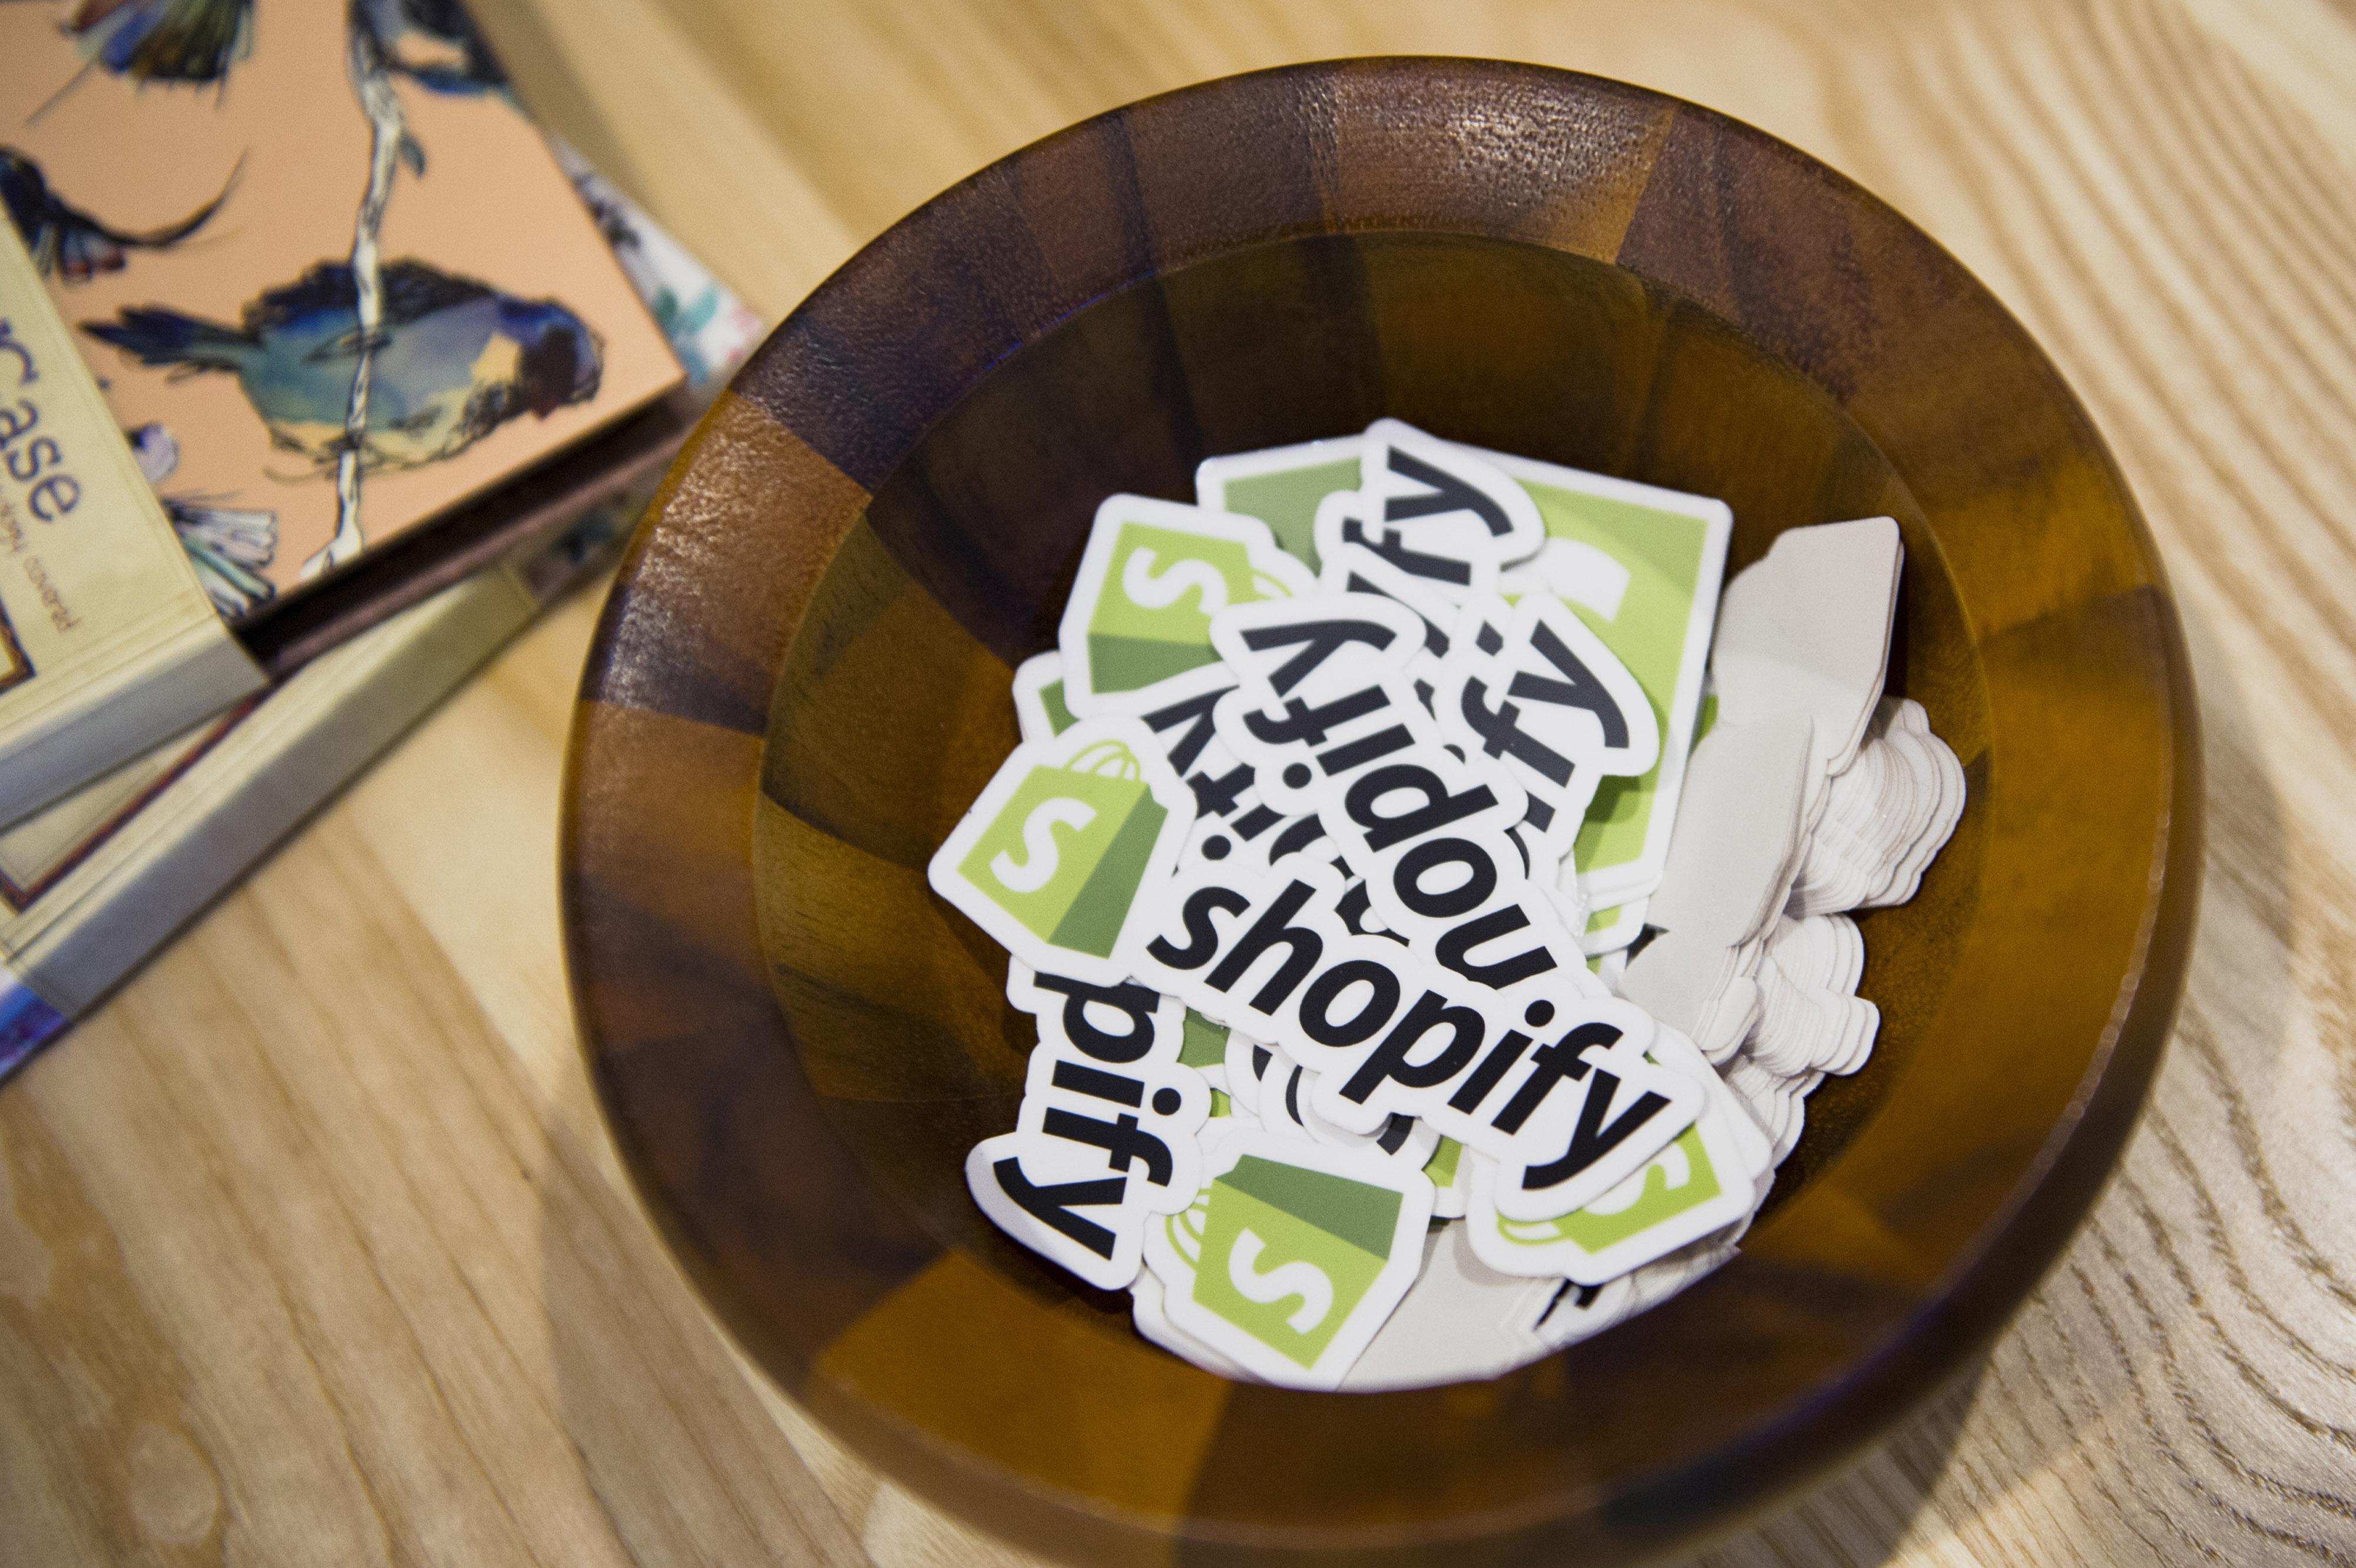 Shopify Inc. Headquarters As Company's Third-Quarter Sales Beat Estimates